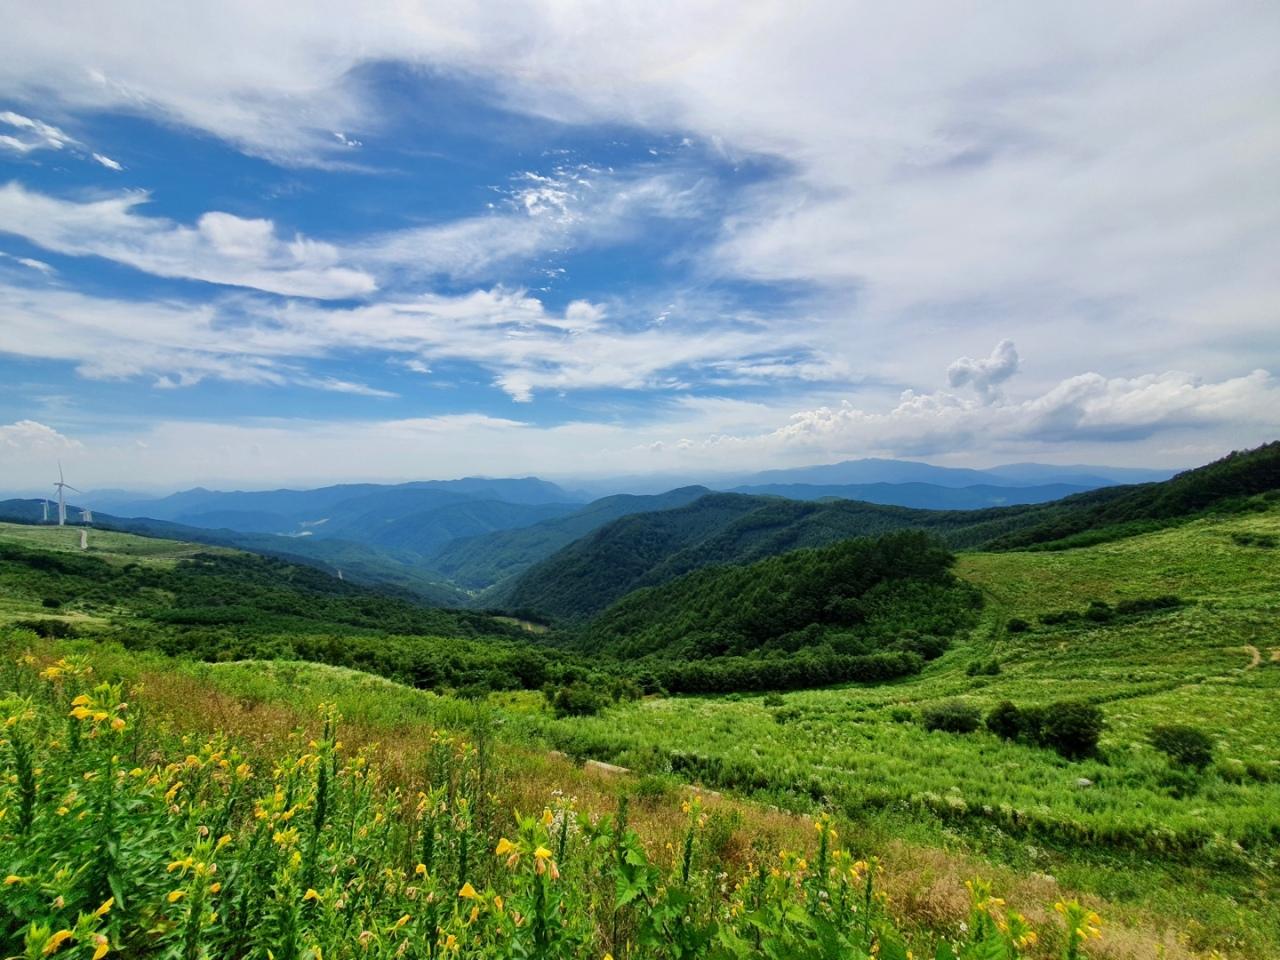 View from 600 Majigi spot at Cheongoksan in PyeongChang, Gangwon Province (Im Eun-byel / The Korea Herald)